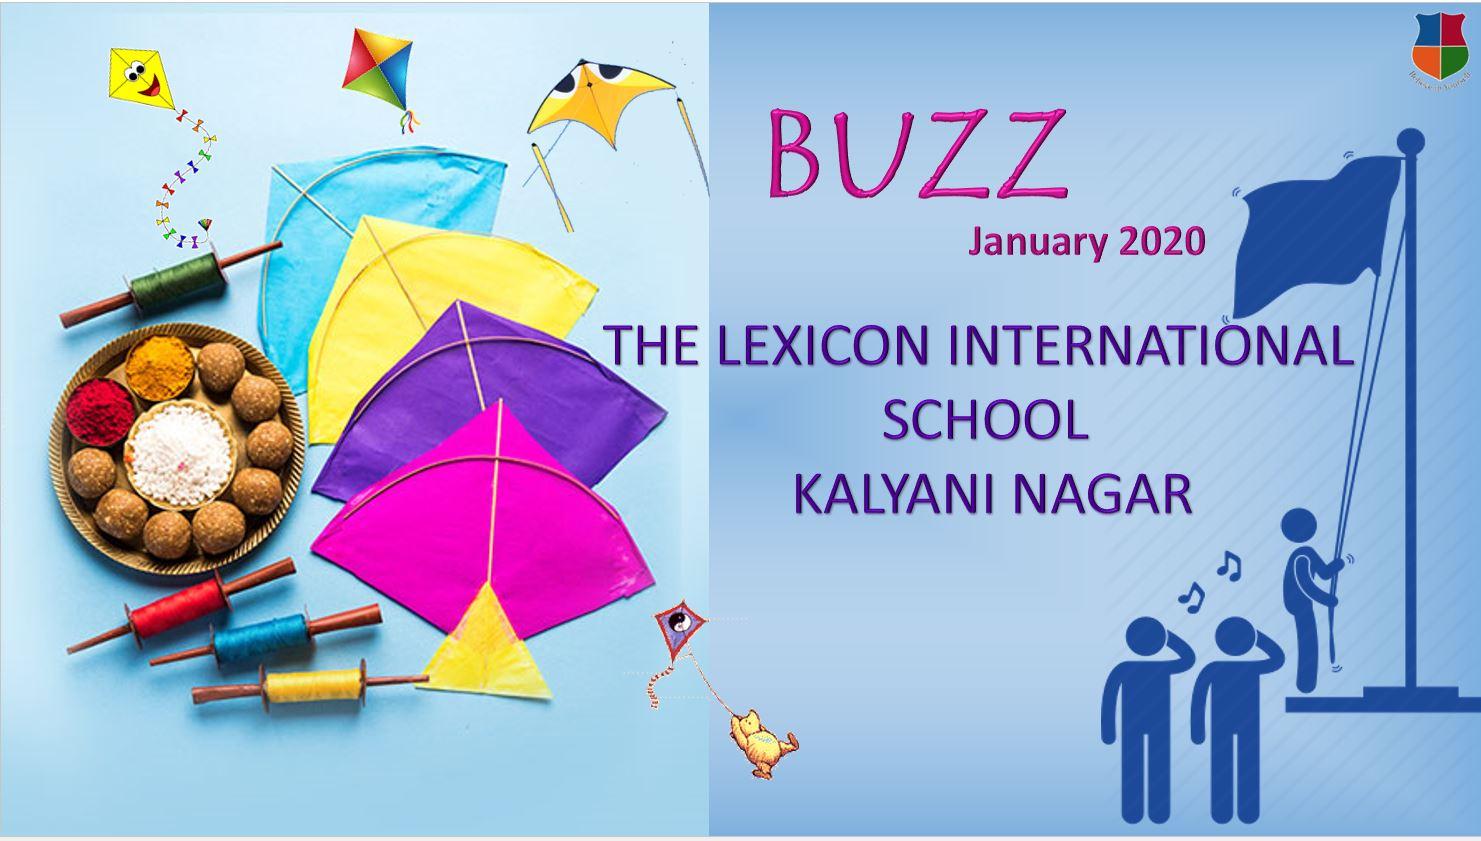 Buzz - The Lexicon School Kalyani Nagar -January 2020